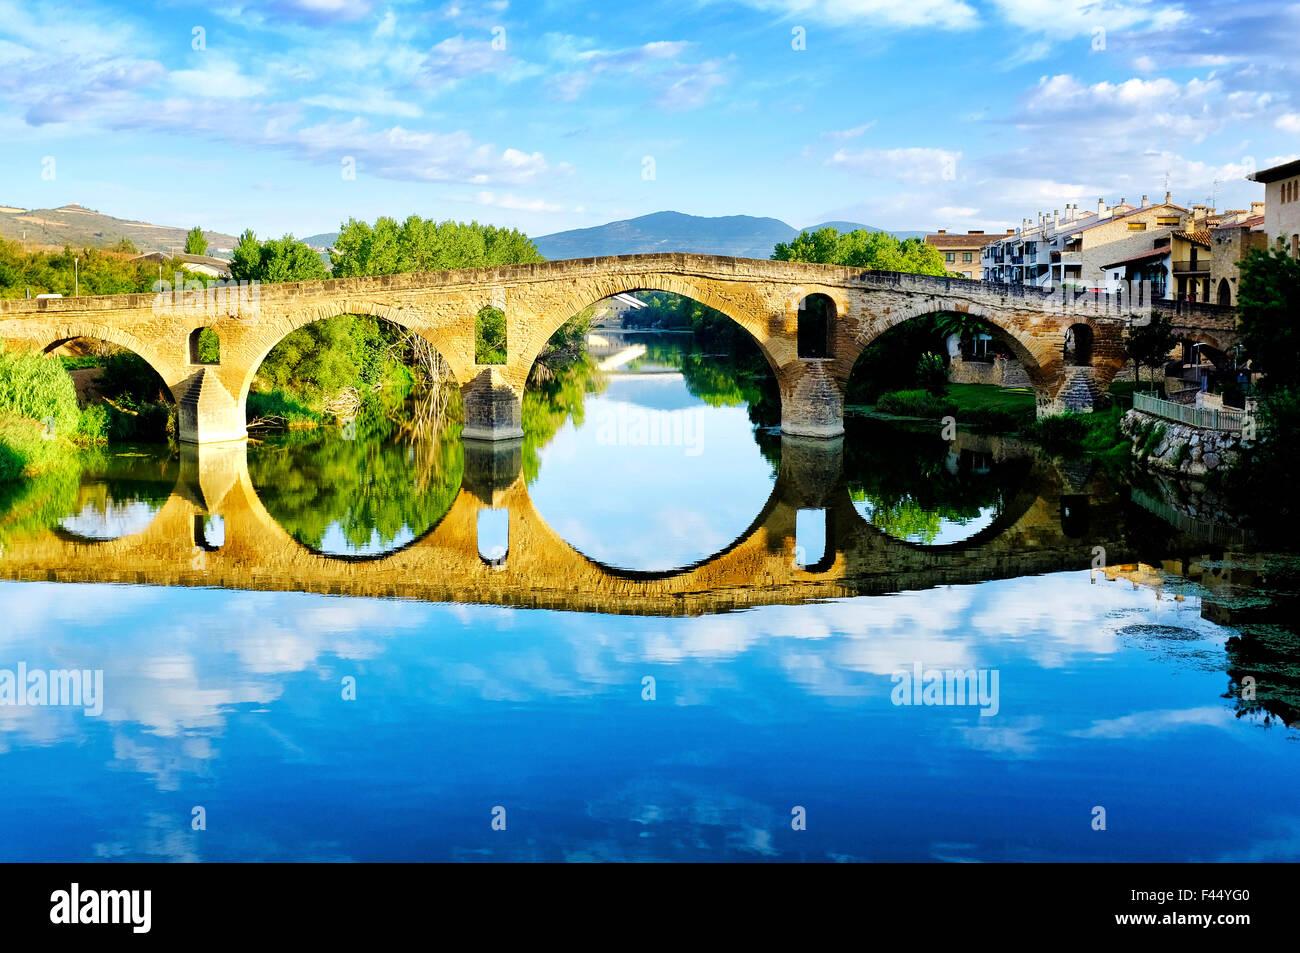 Medieval bridge in Puente La Reina, Navarre, Spain. Stock Photo